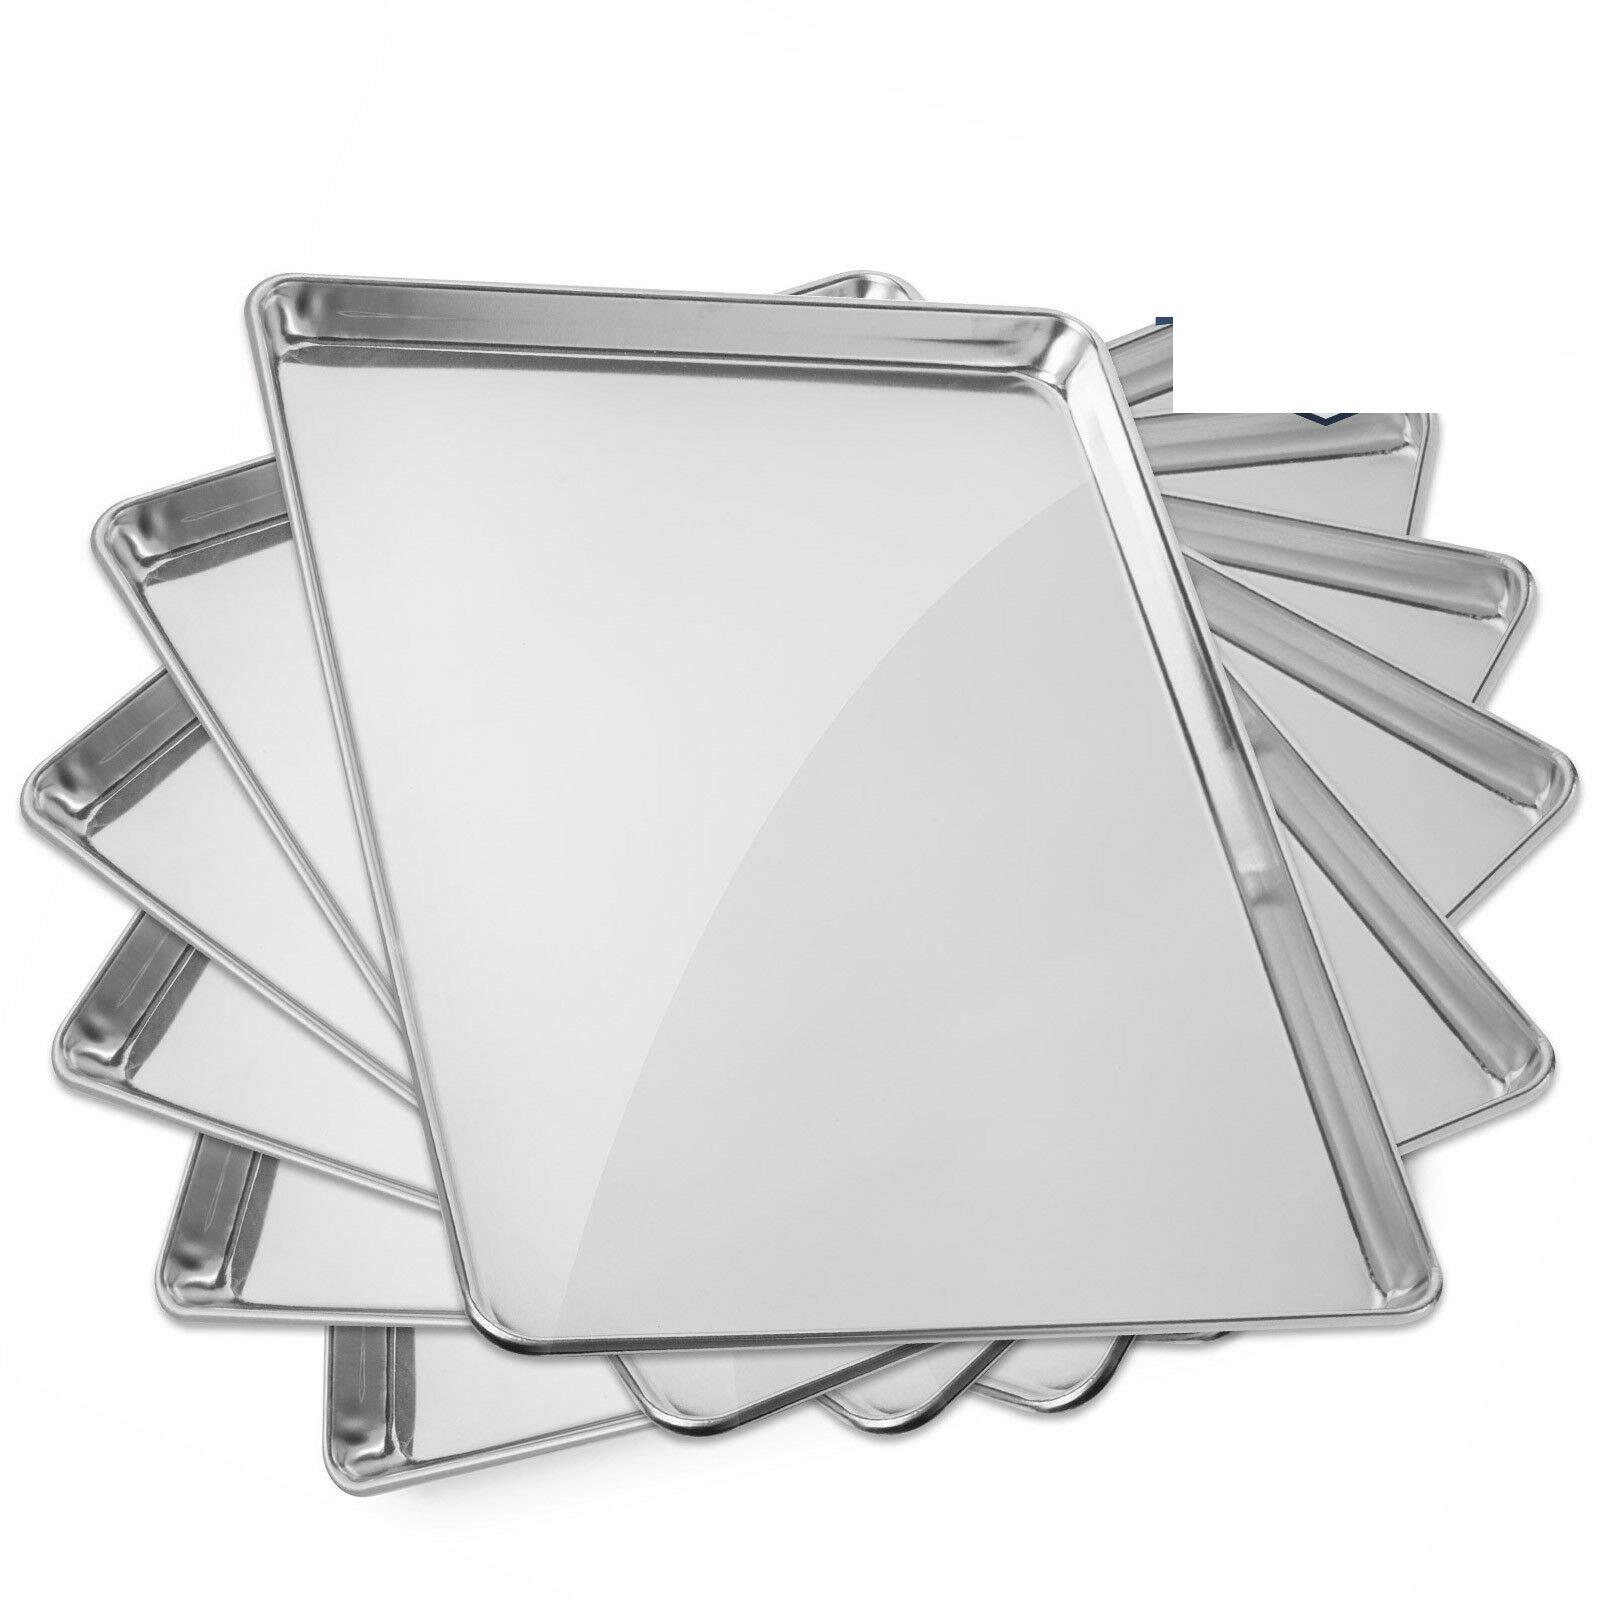 6 Pans Aluminum Baking Pans 18 x 26 Inch #MWMN